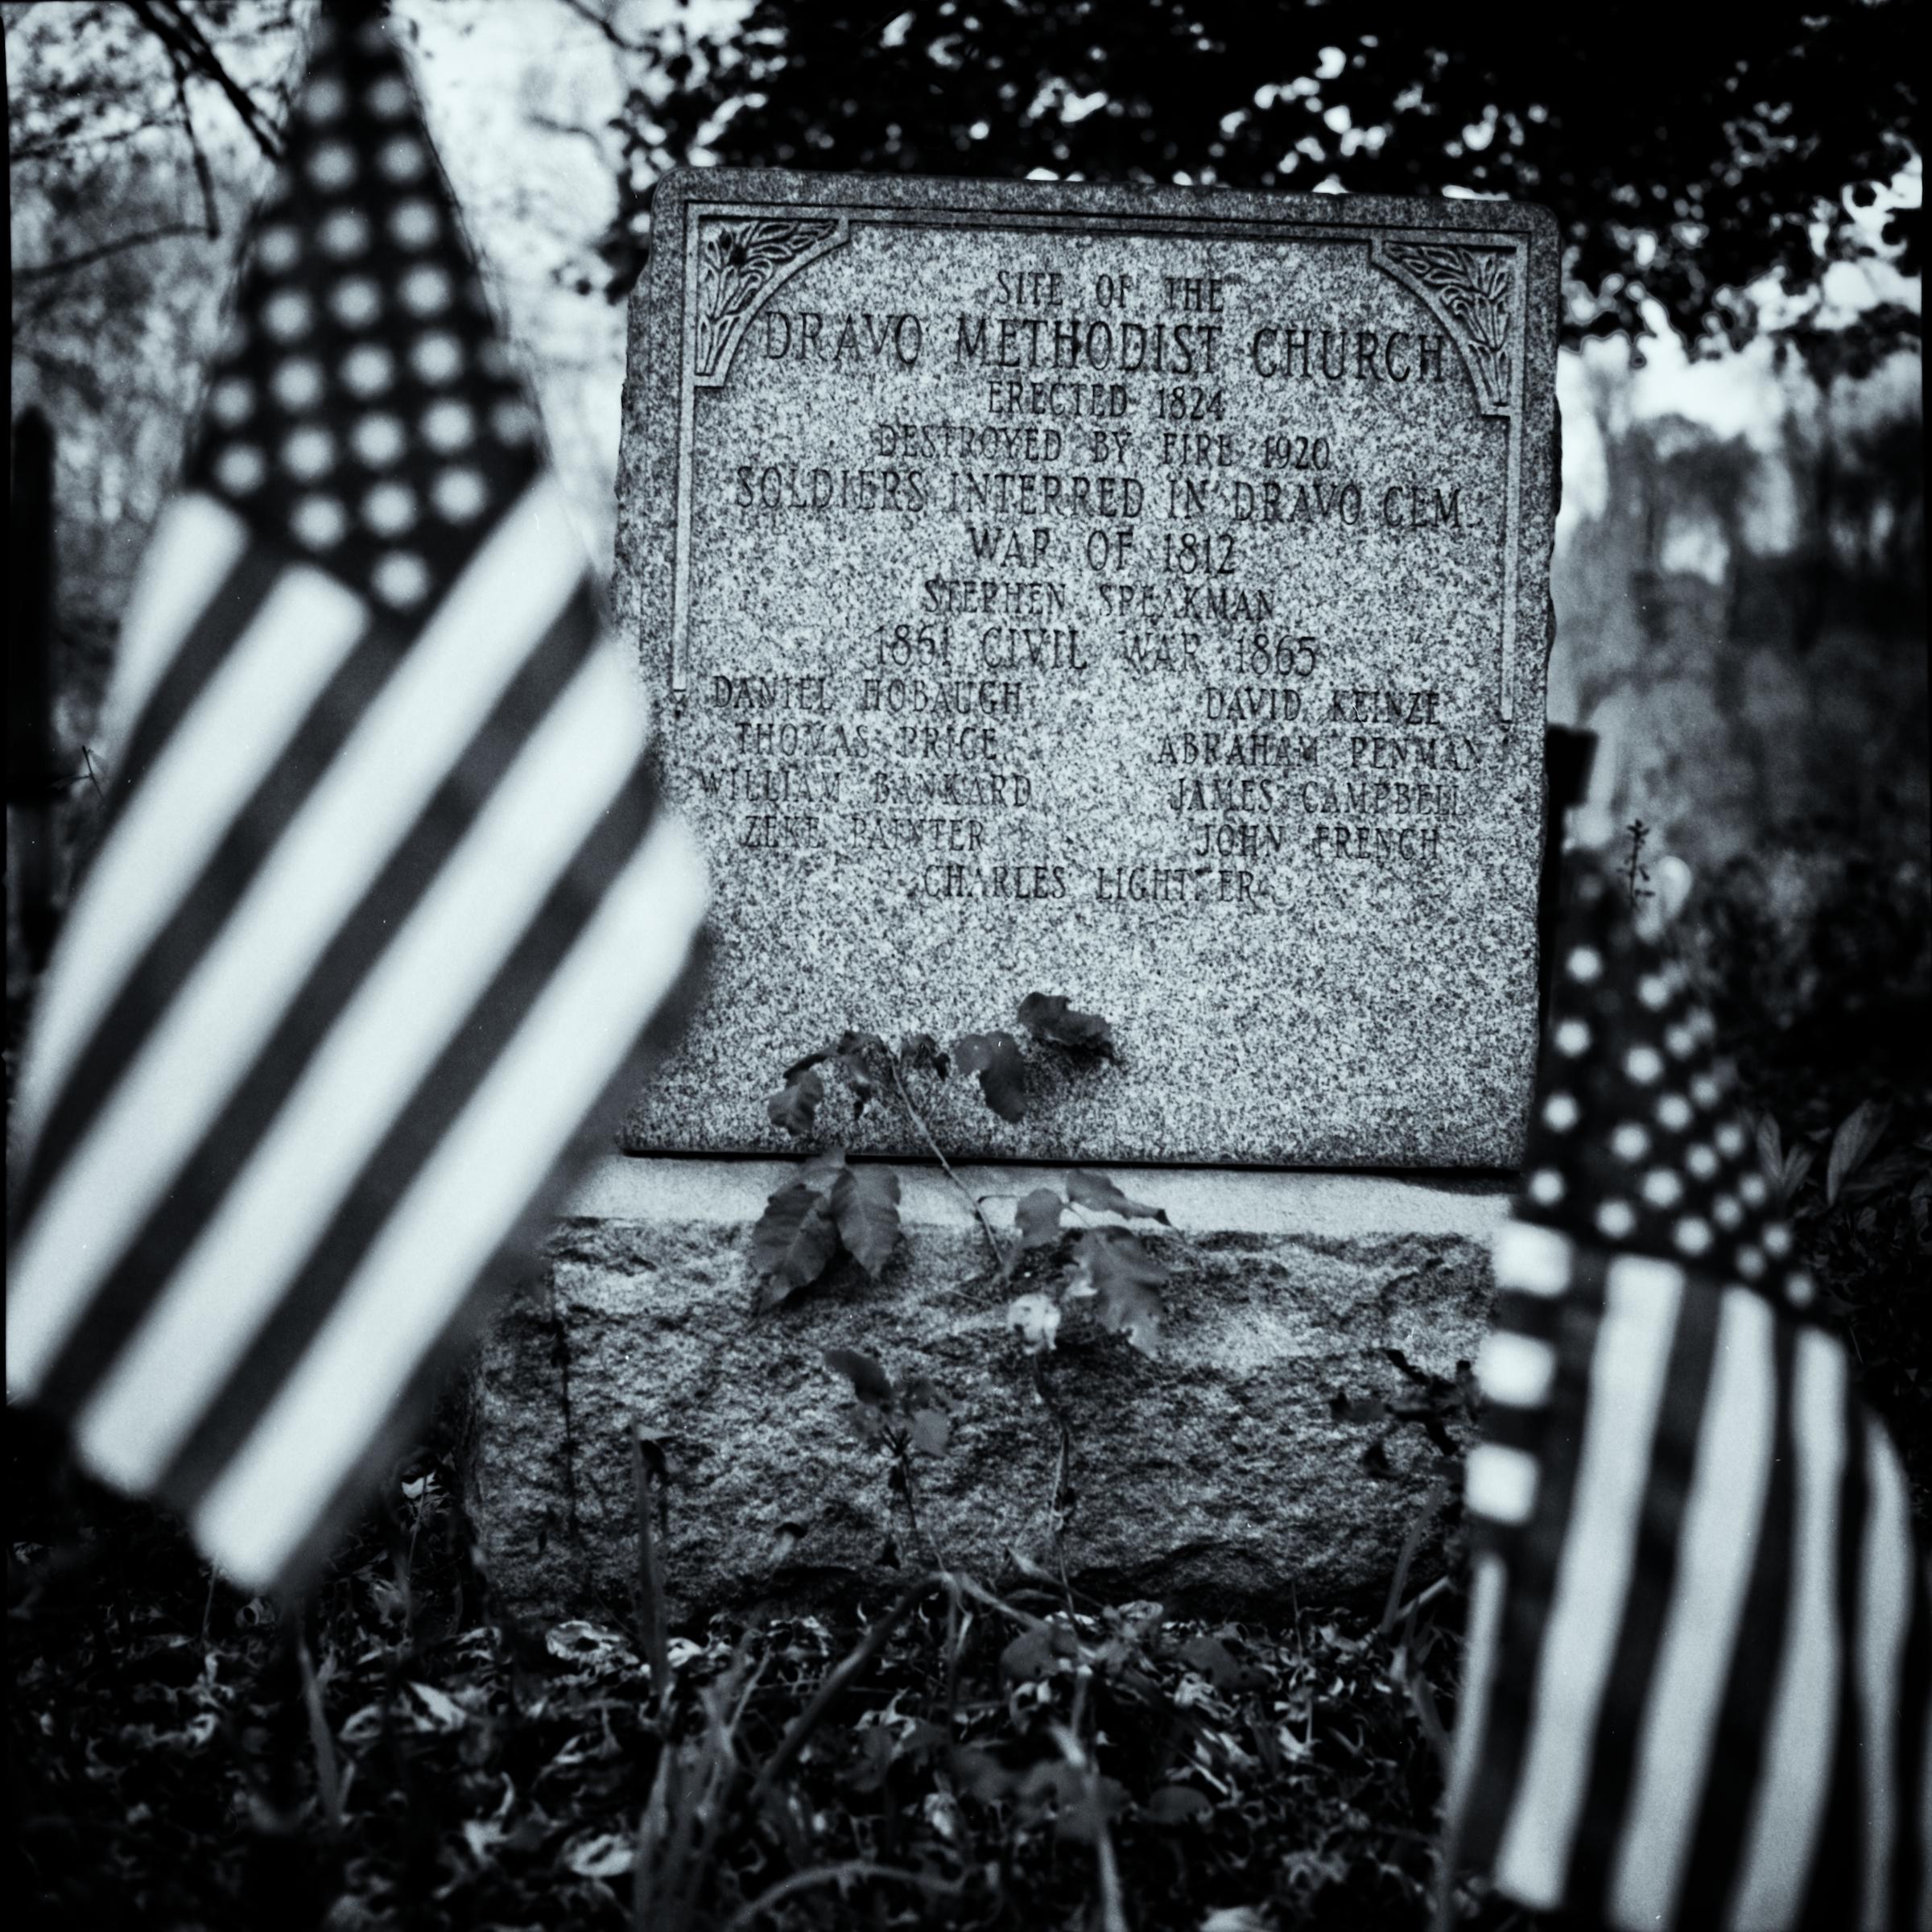 Dravo Cemetery: Dravo Methodist Church - Erected 1824